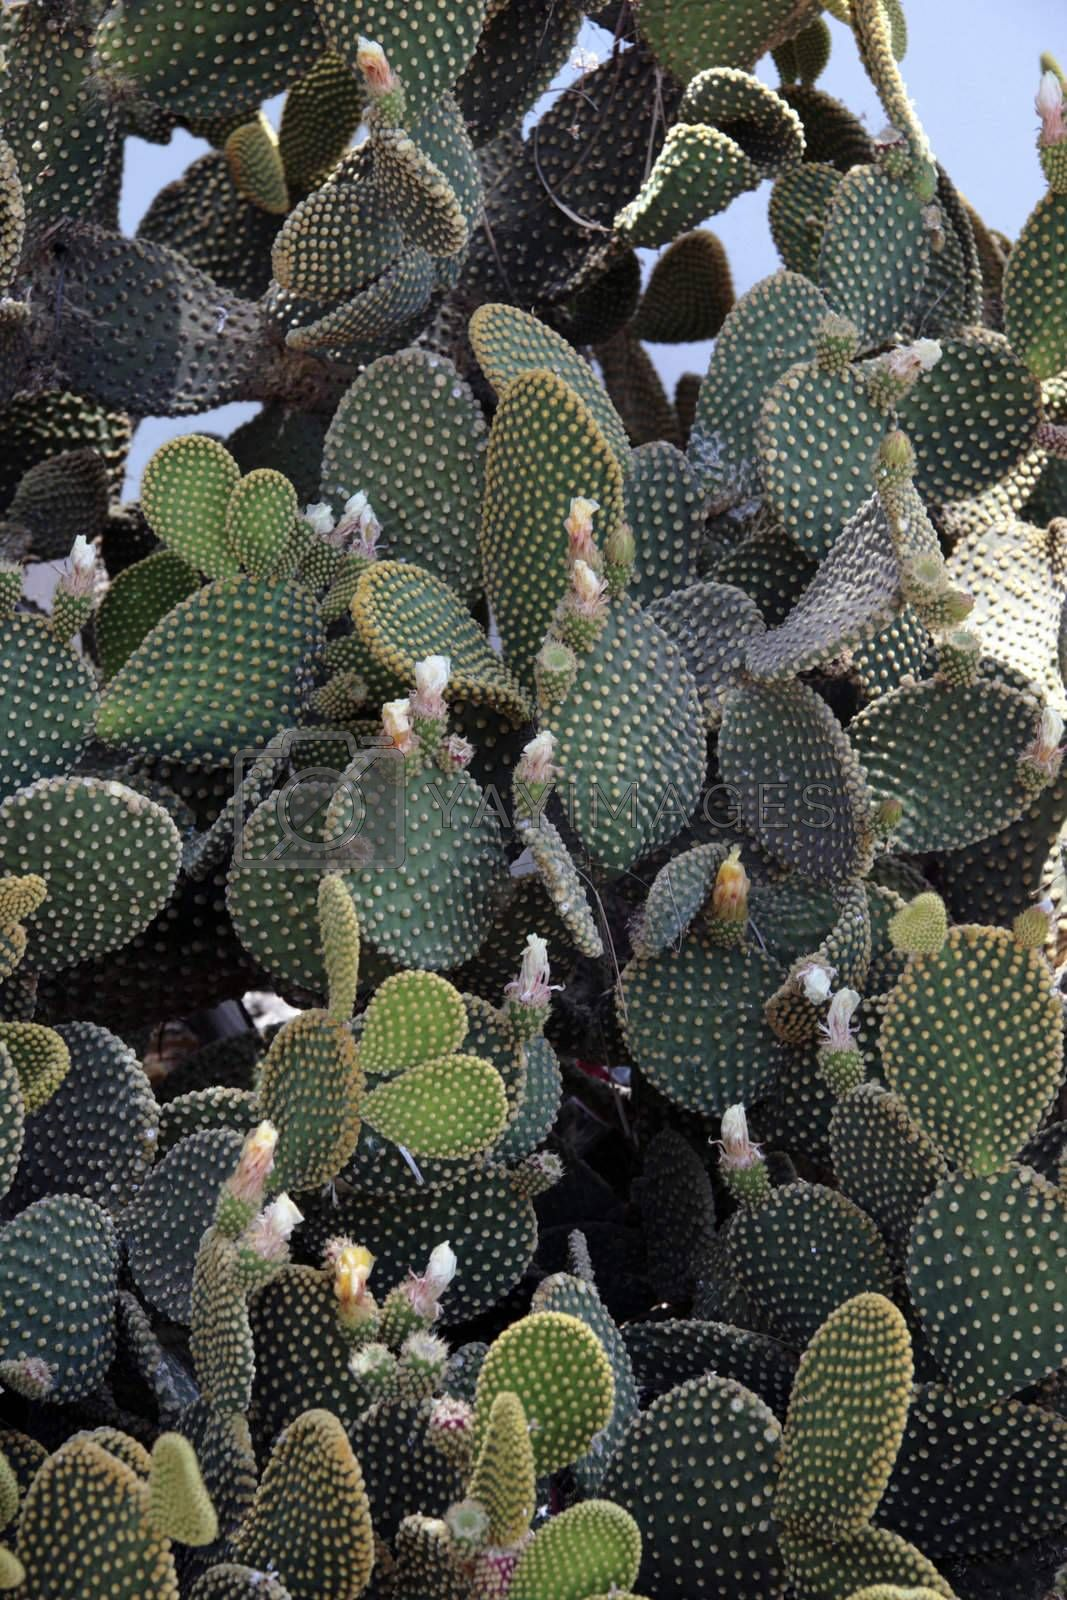 a flowering cactus on a mediteranean island